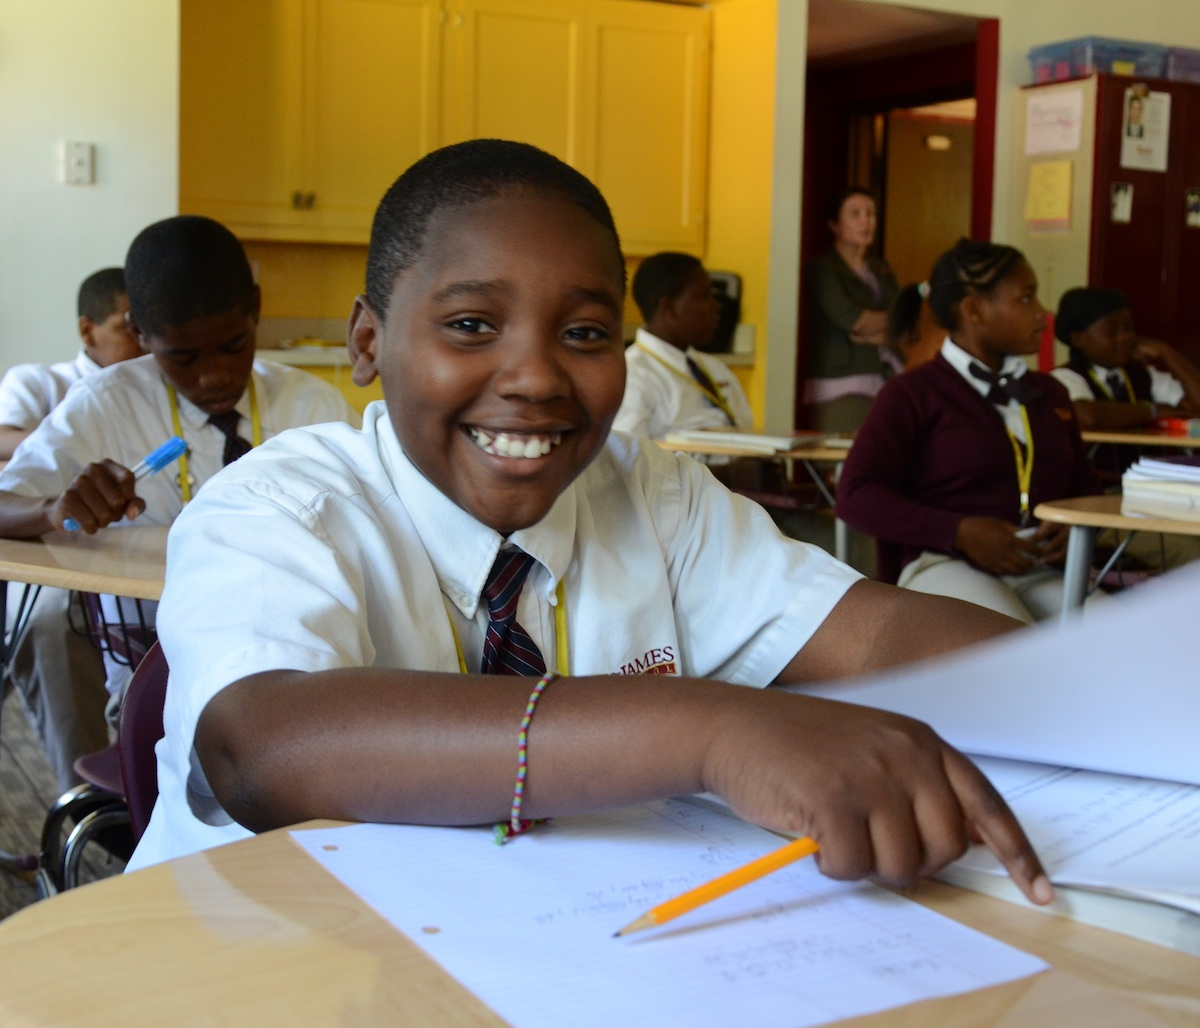 St. James boy smiling.jpg